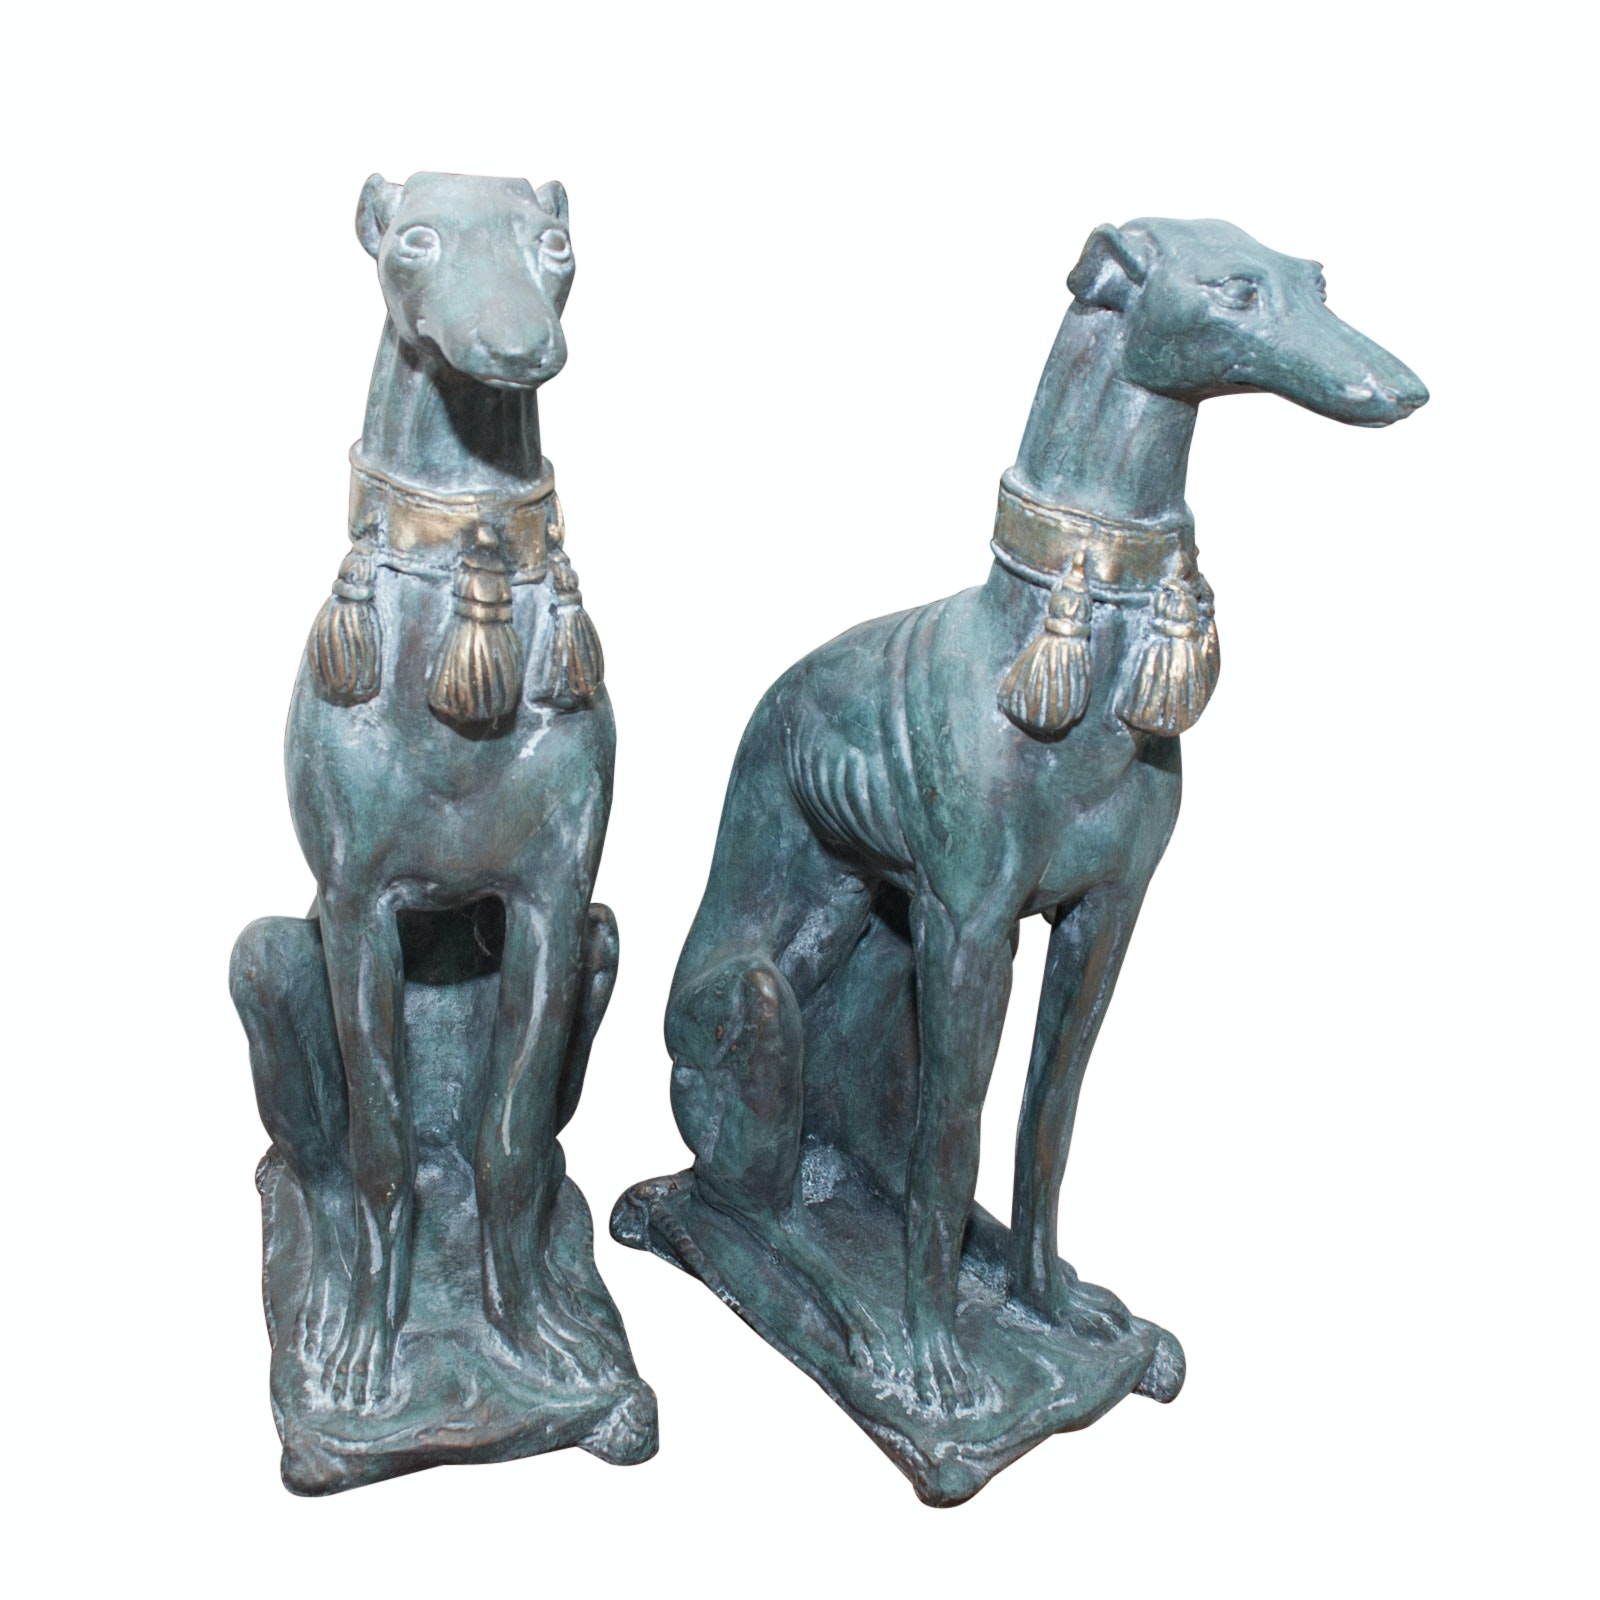 Pair of Greyhound Sculptures